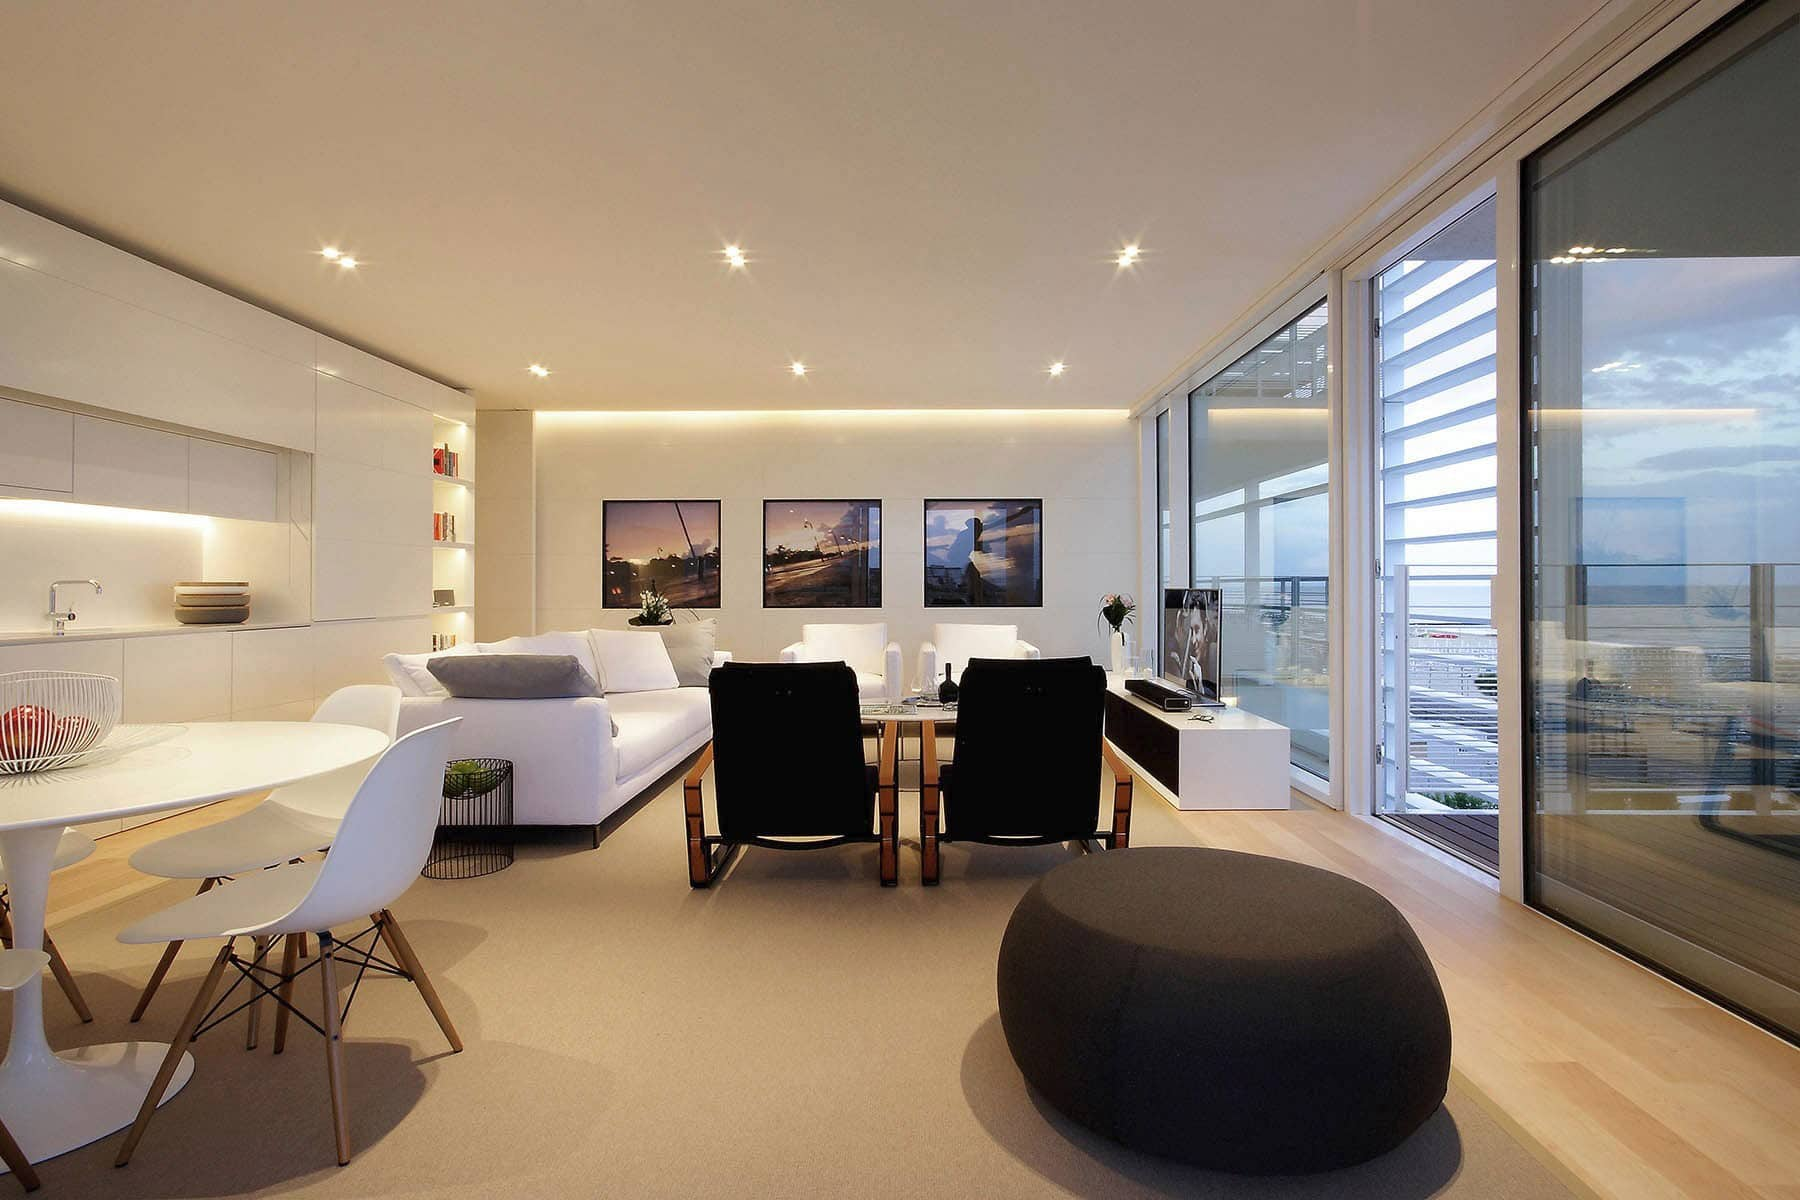 Plano departamento peque o dos dormitorios construye hogar for Comedor pequeno moderno